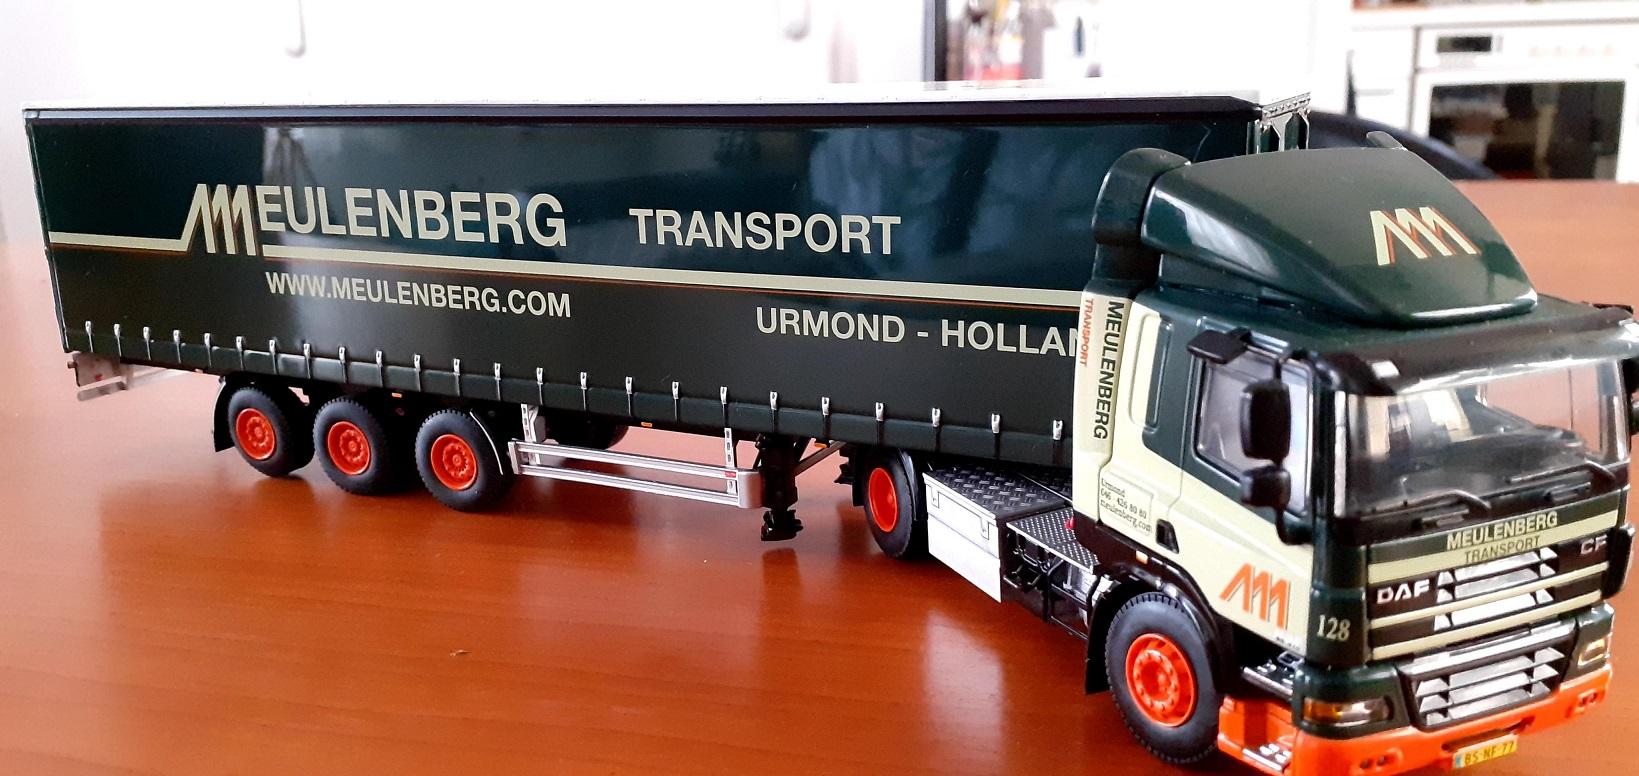 Meulenberg-Xavier-Walstock-berwerkte-delen-modellen-(26)